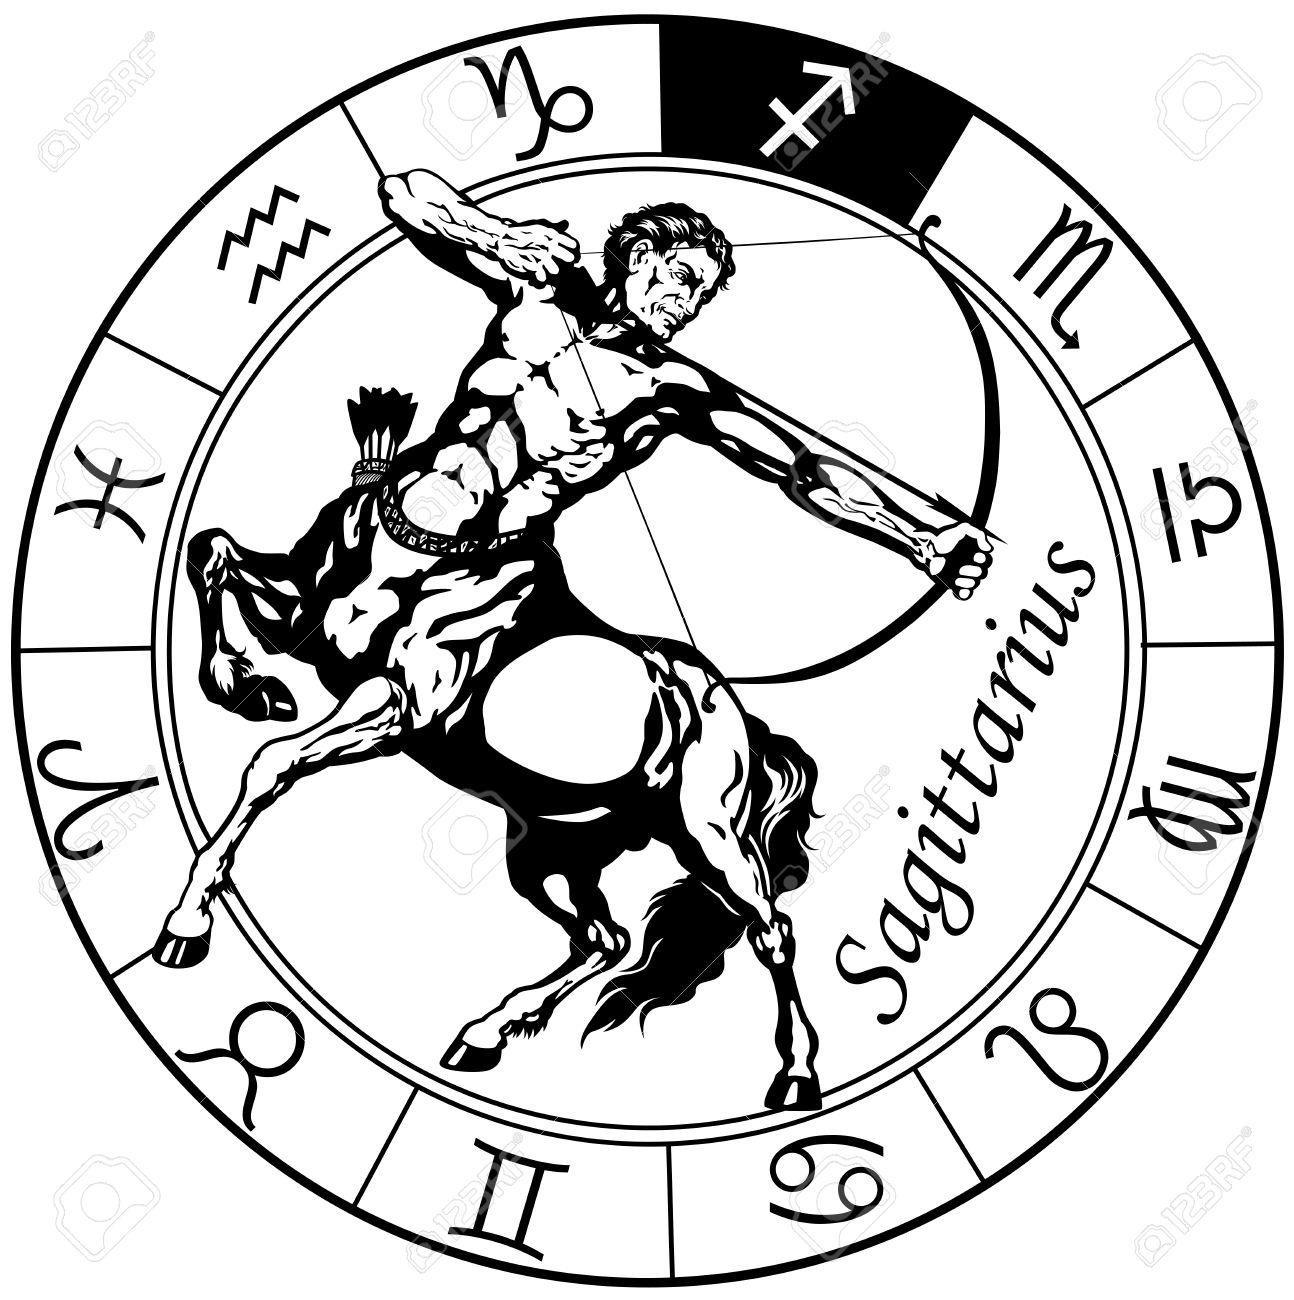 Sagittarius the centaur archer astrological zodiac sign black sagittarius the centaur archer astrological zodiac sign black and white isolated image stock vector biocorpaavc